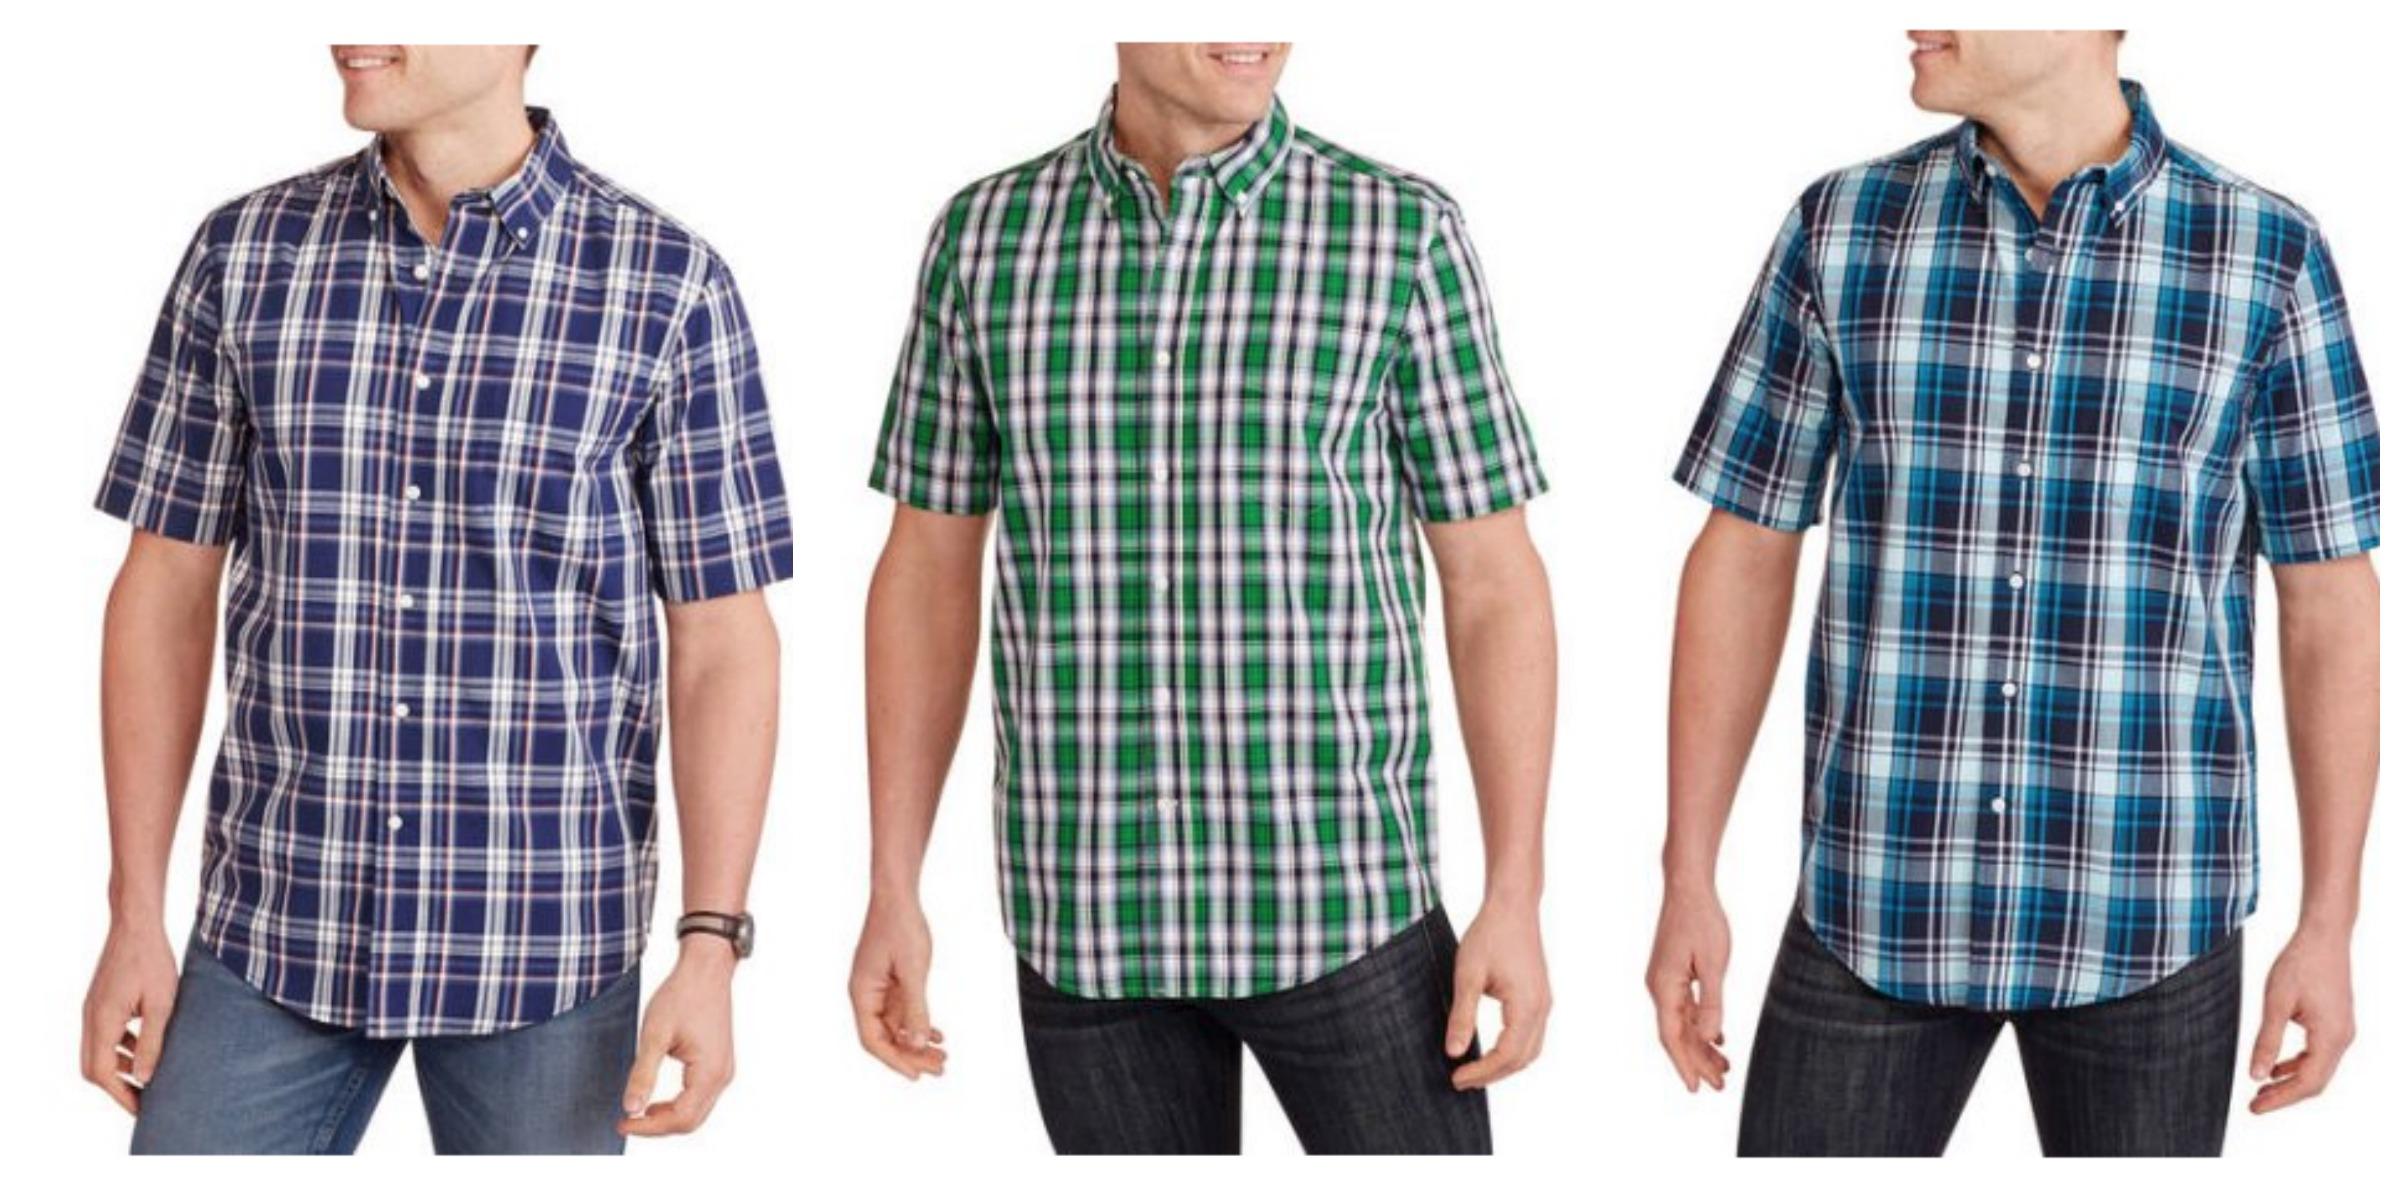 freebies2deals-shirts